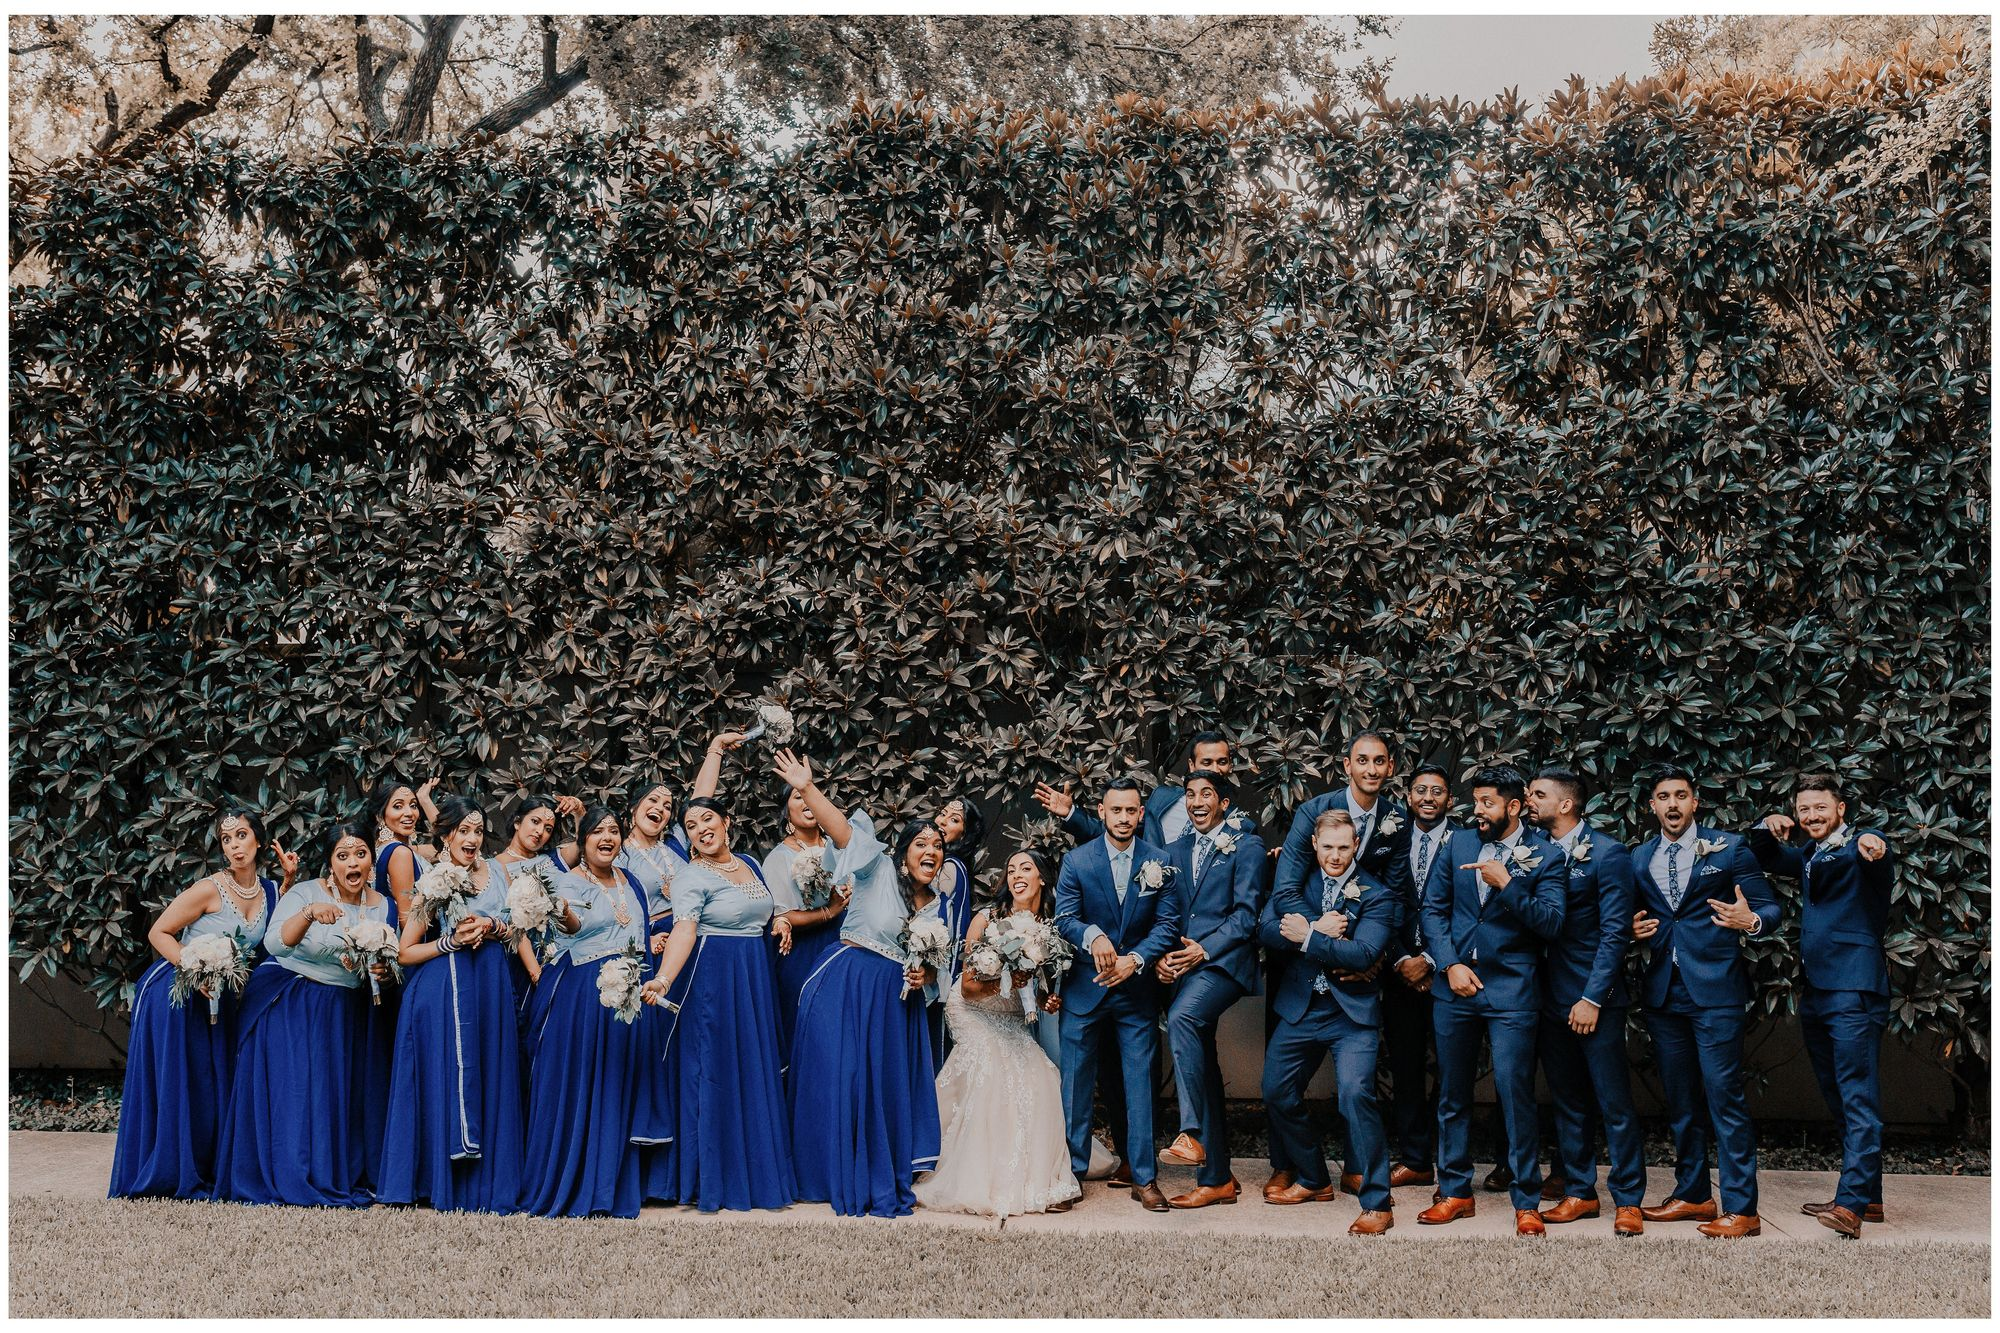 Top 15 Indian Wedding Reception Bridal Party Entrance